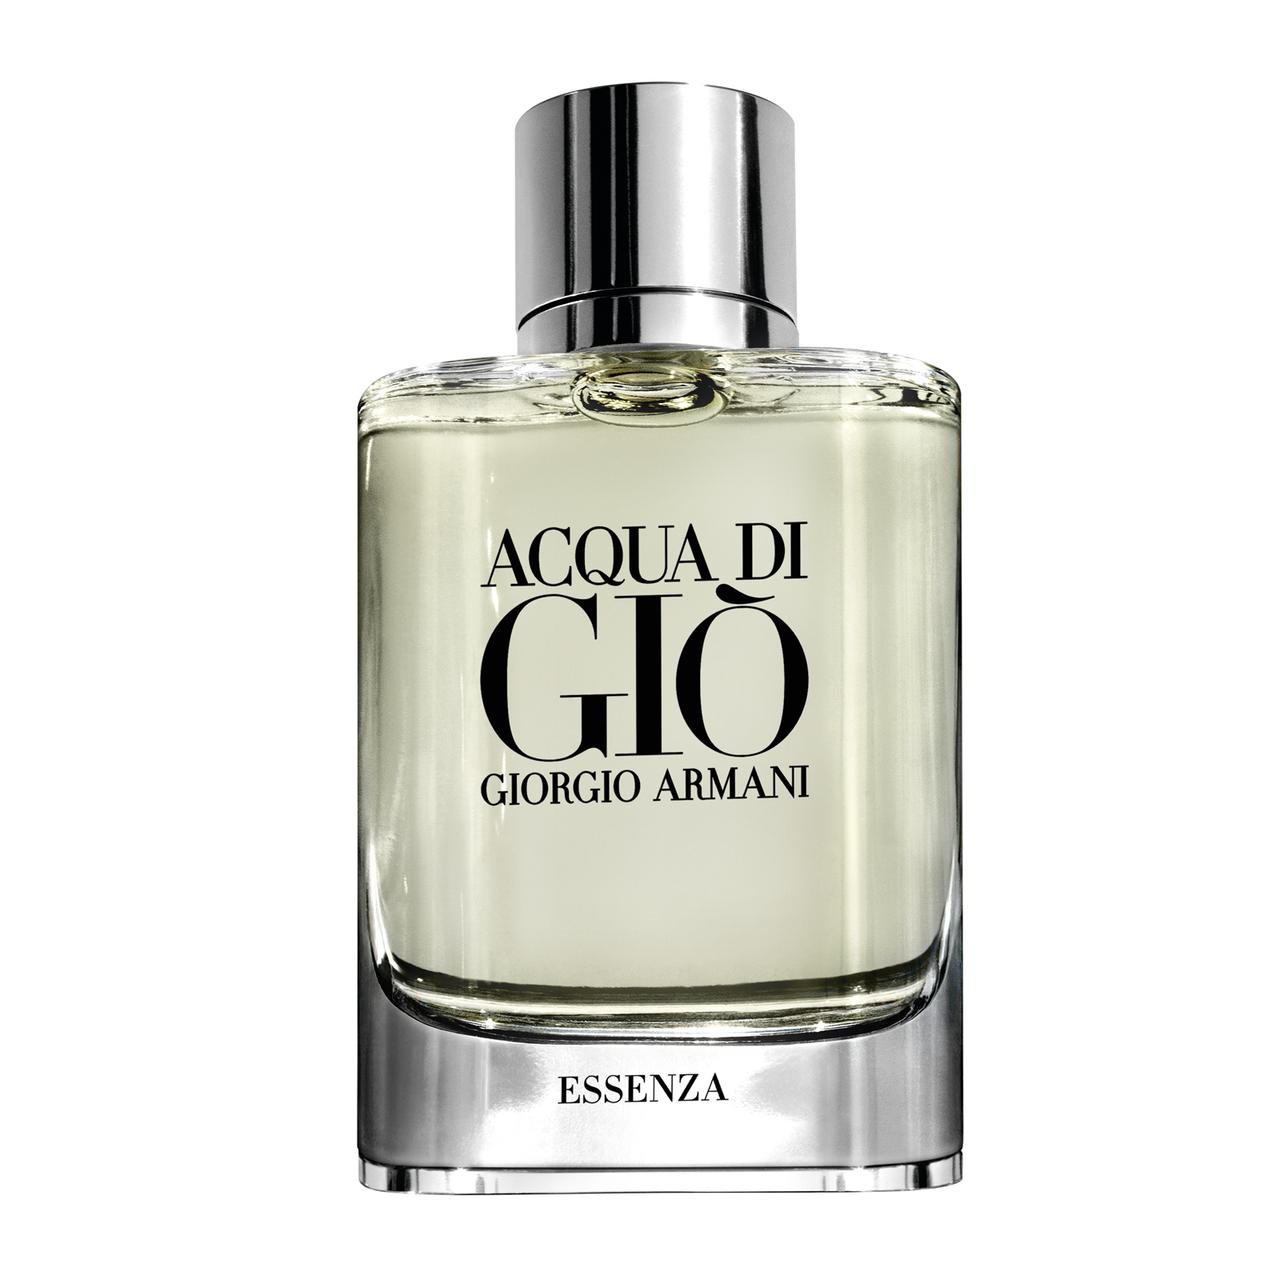 Acqua Di Gio Essenza Eau De Parfum By Giorgio Armani Scentfly